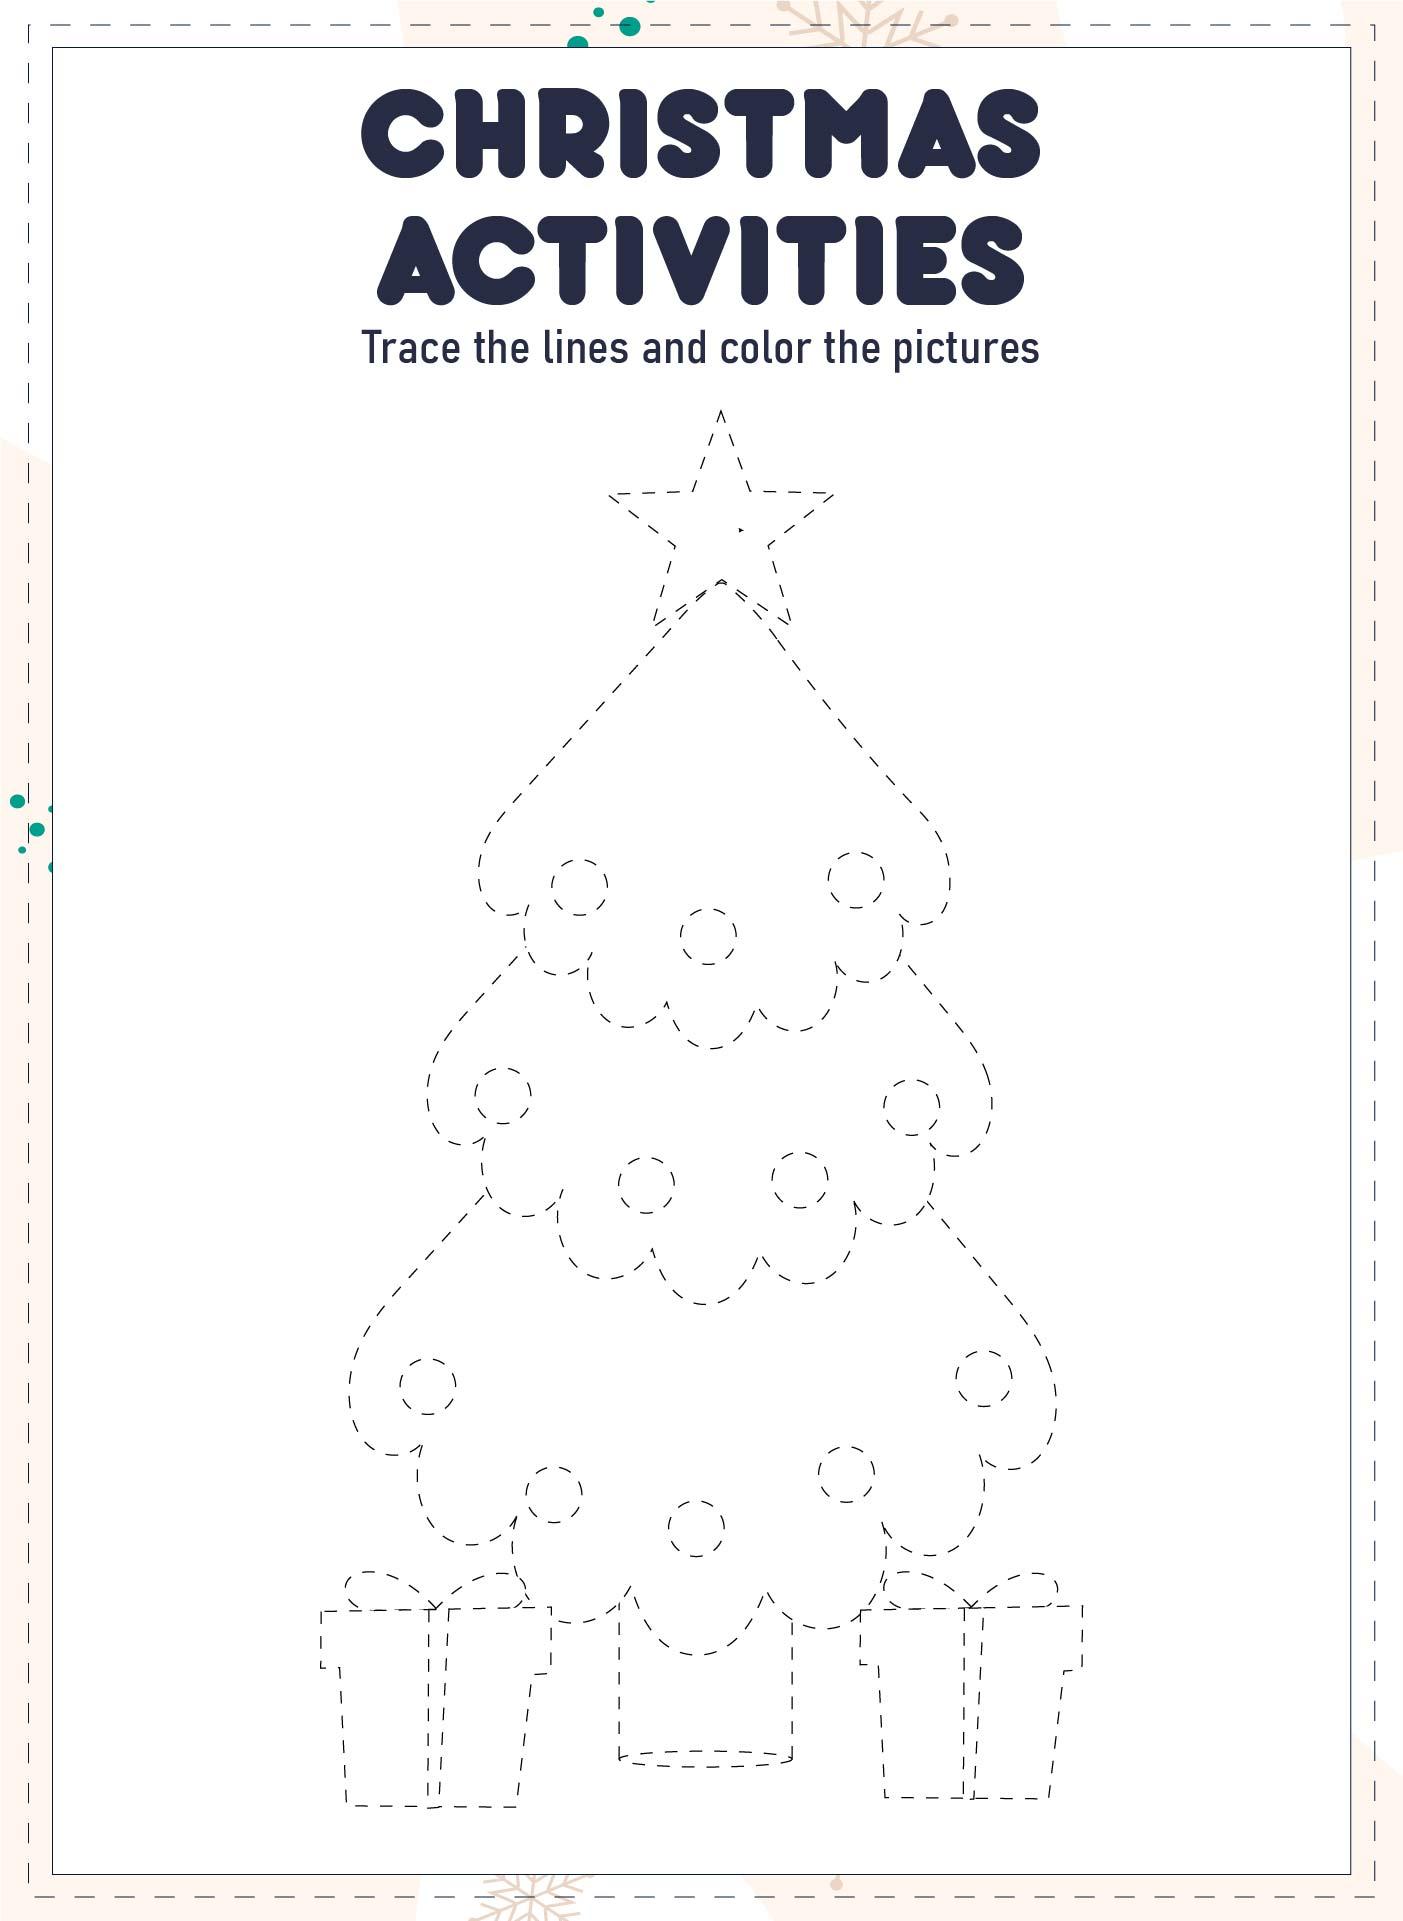 Number Names Worksheets free christmas work sheets : Kindergarten Christmas Activity Worksheets - Worksheets for Kids ...